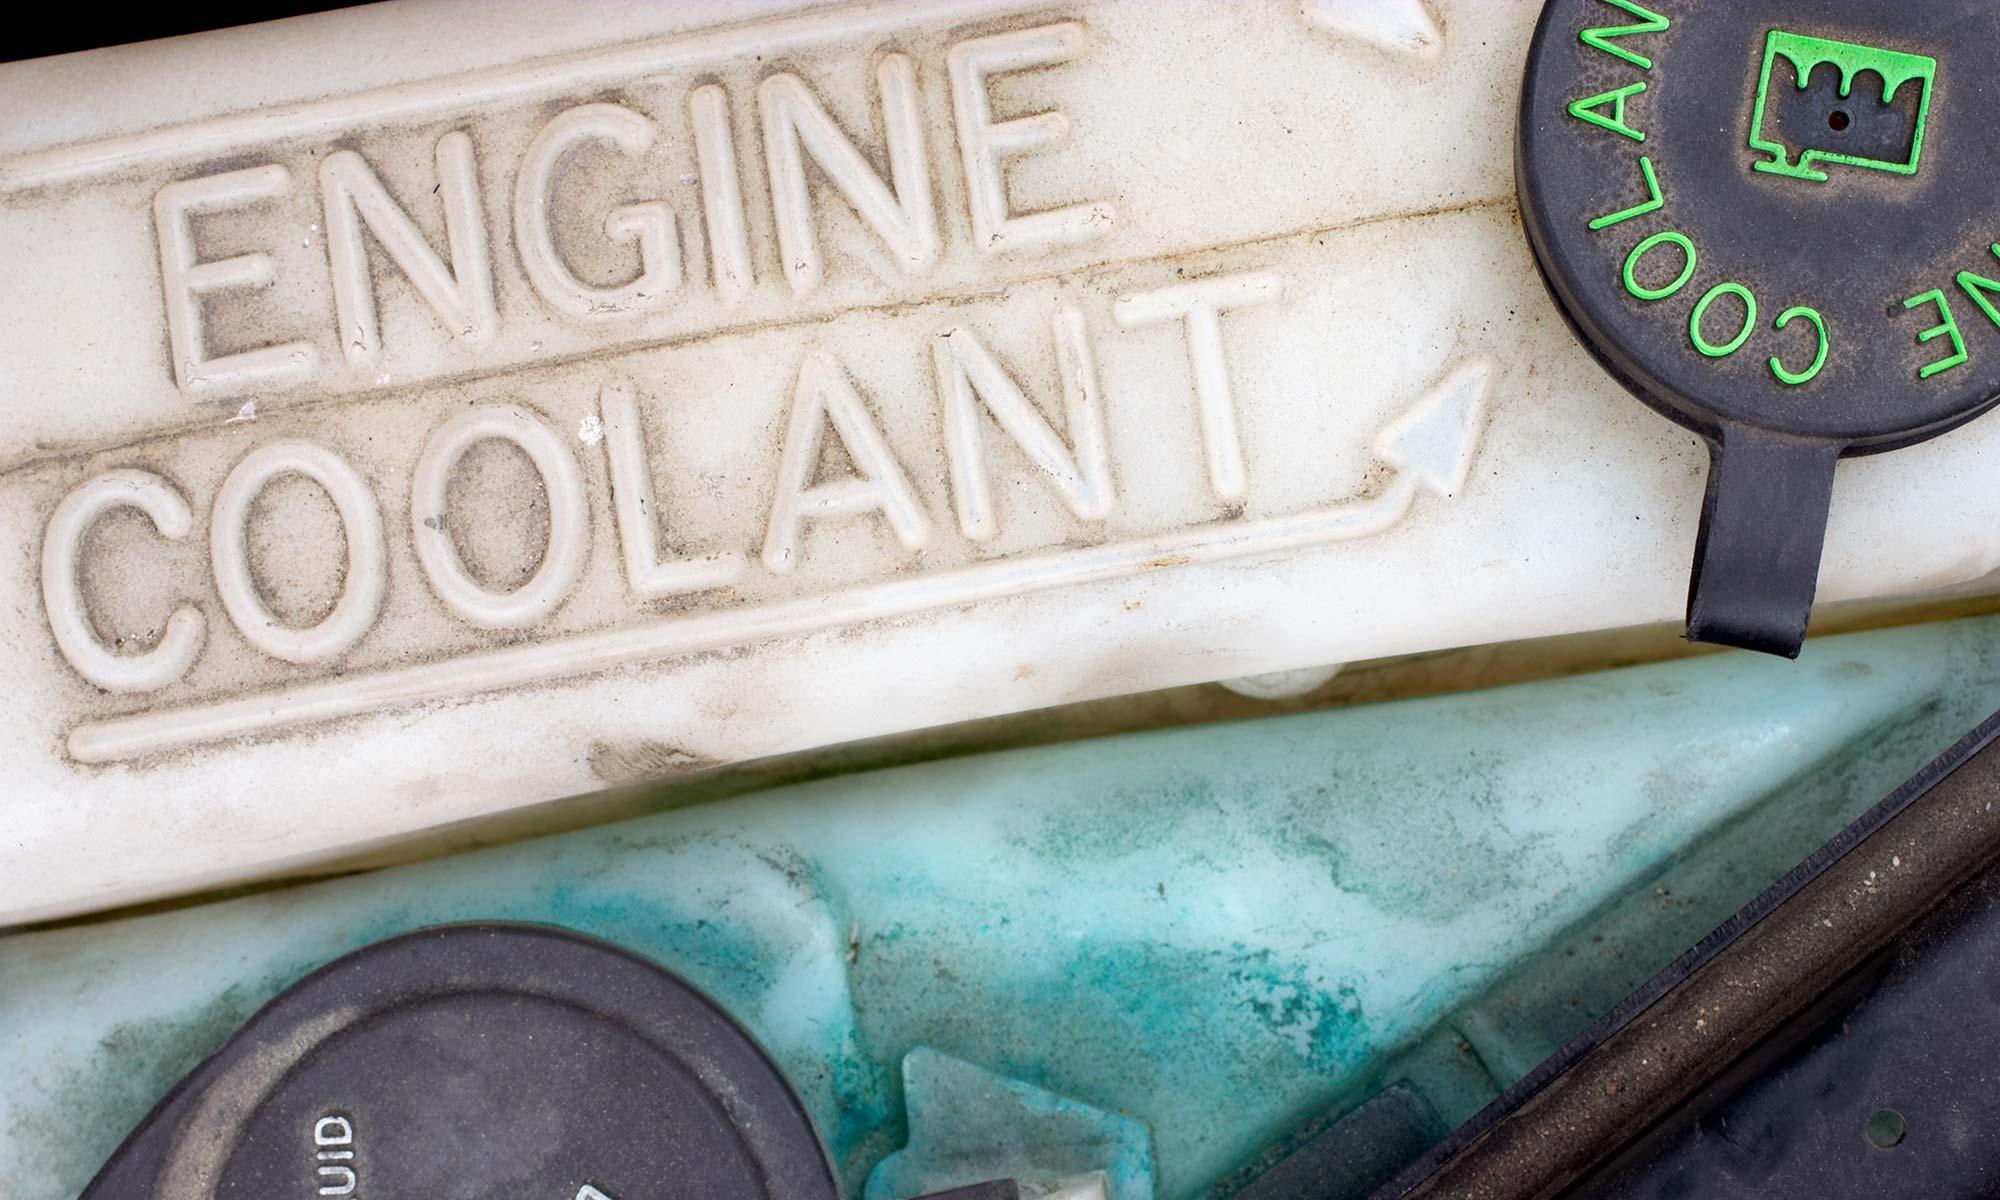 engine_coolant